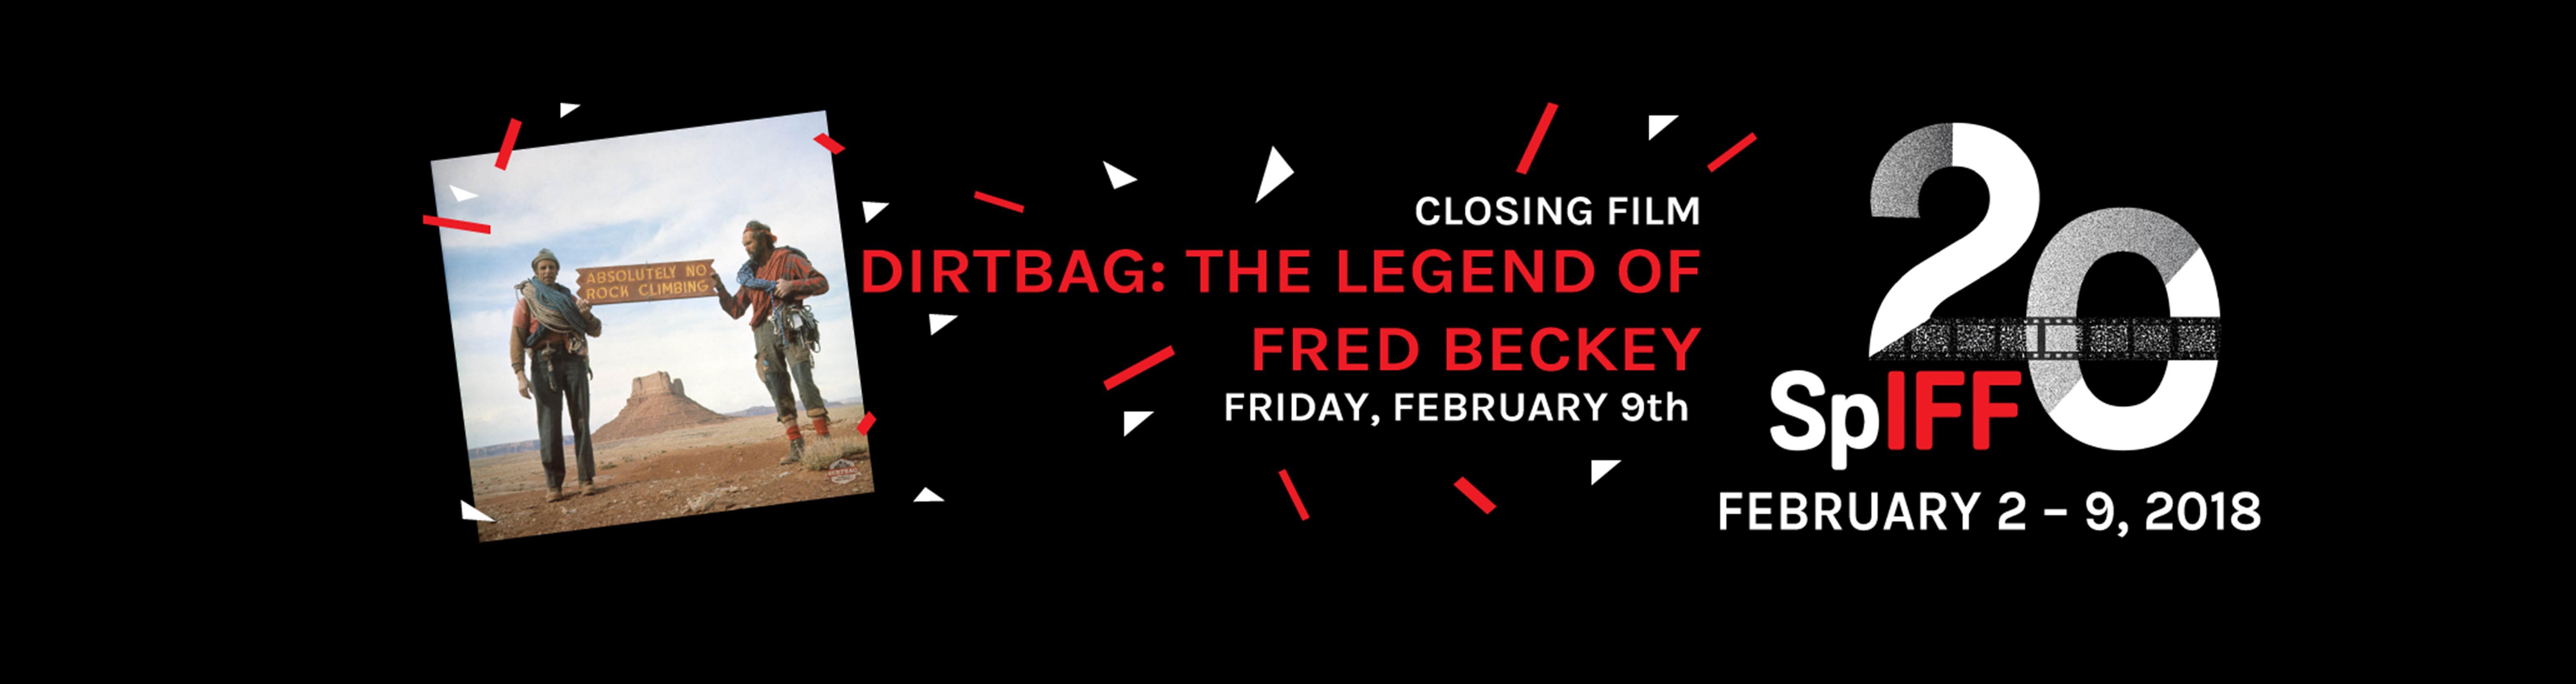 Closing Film - Dirtbag: The Legend of Fred Beckey